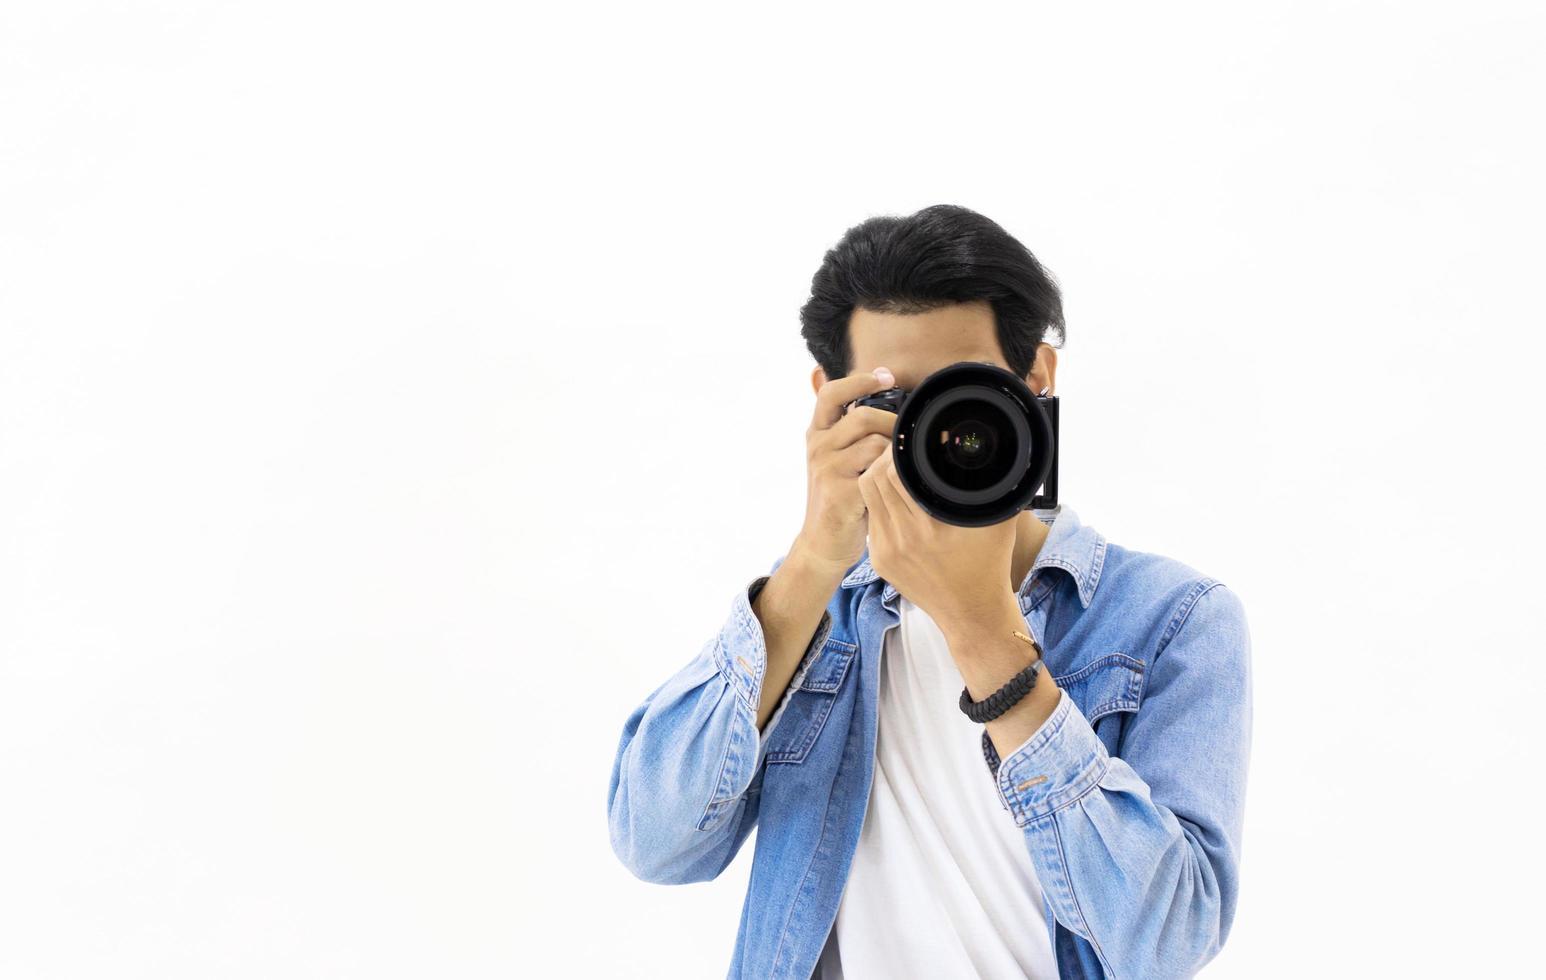 manlig fotograf framför vit bakgrund foto